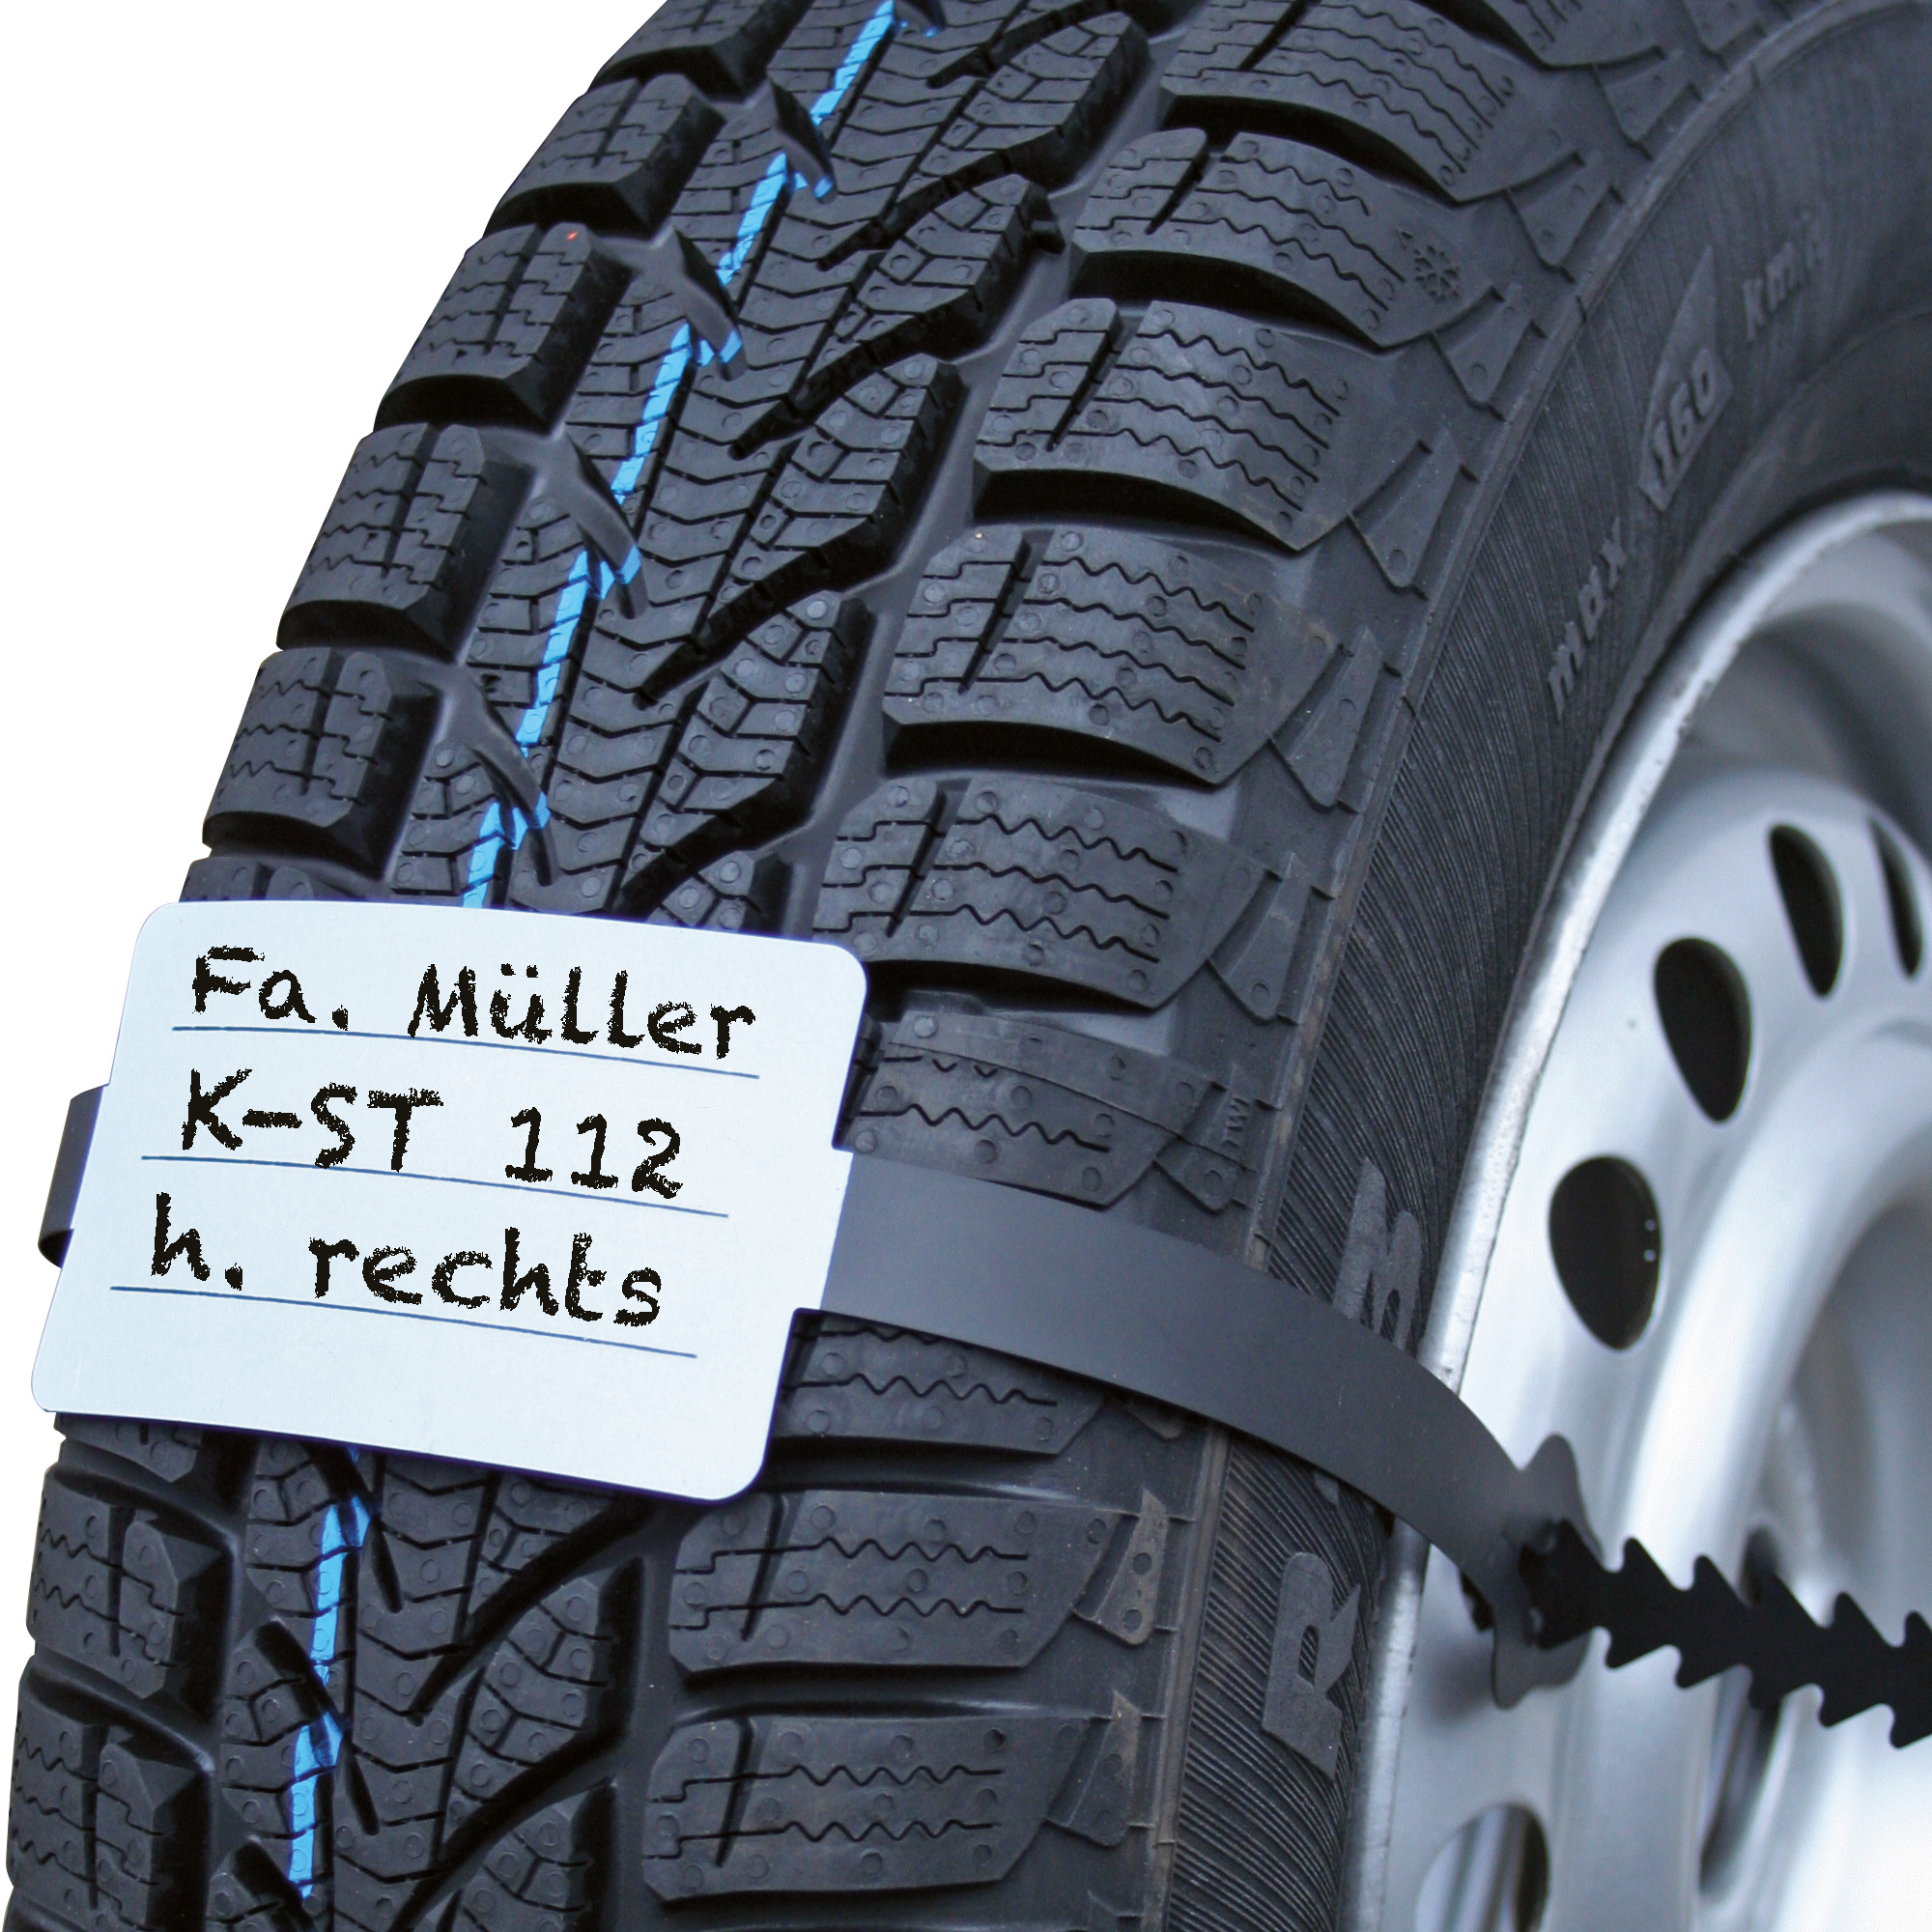 Wheel / Tyre Pendant with Fixing Band